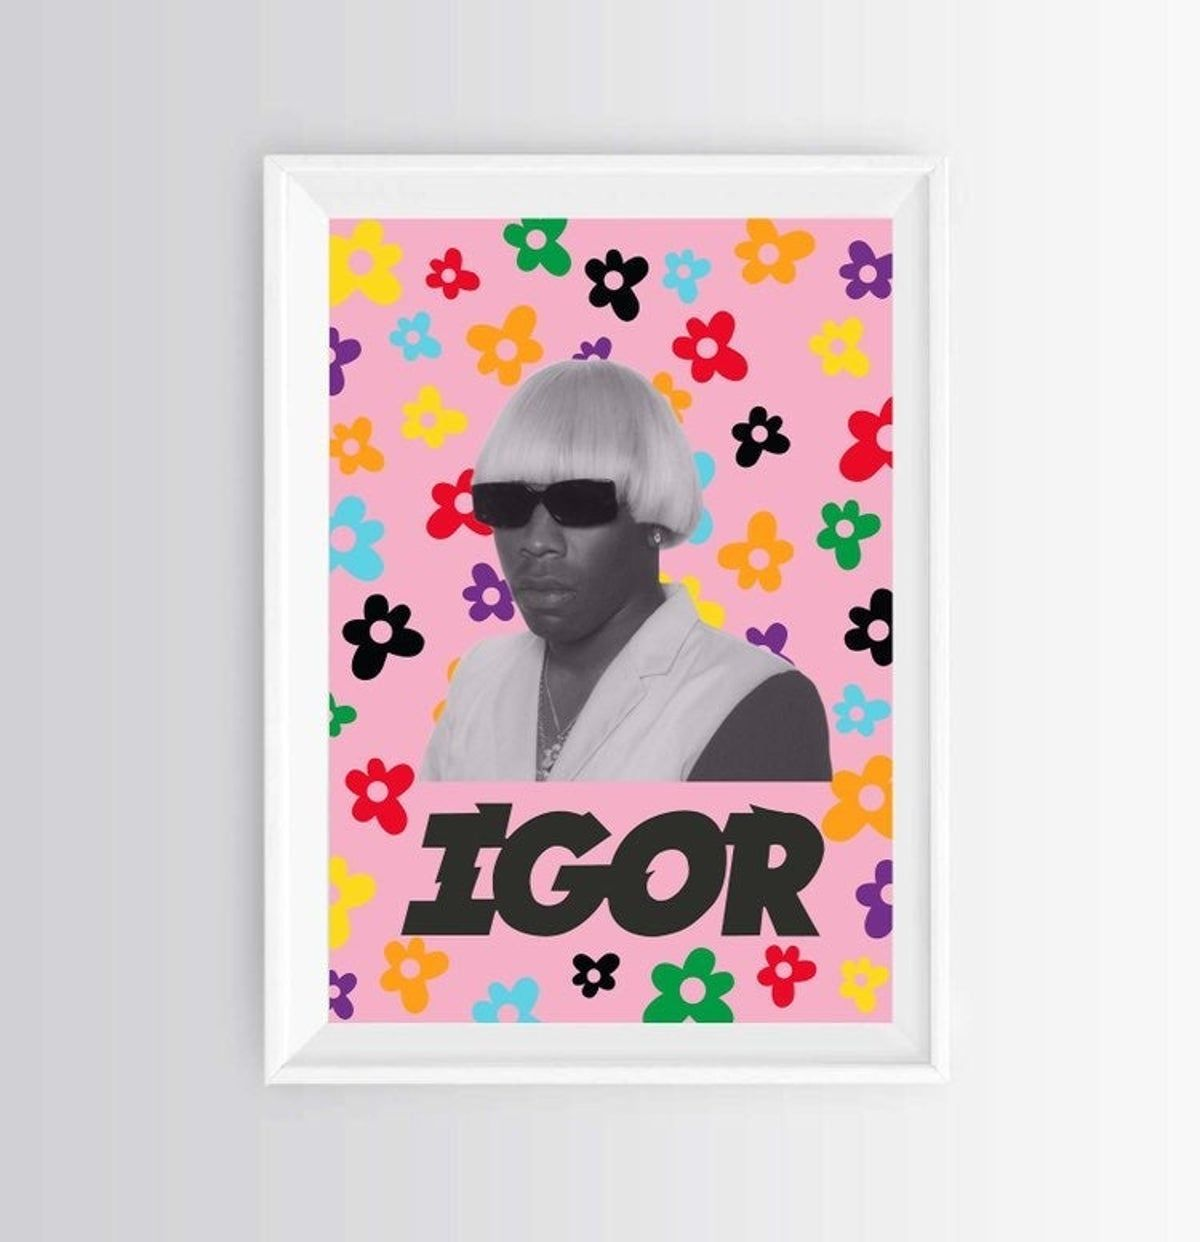 tyler the creator poster tyler the